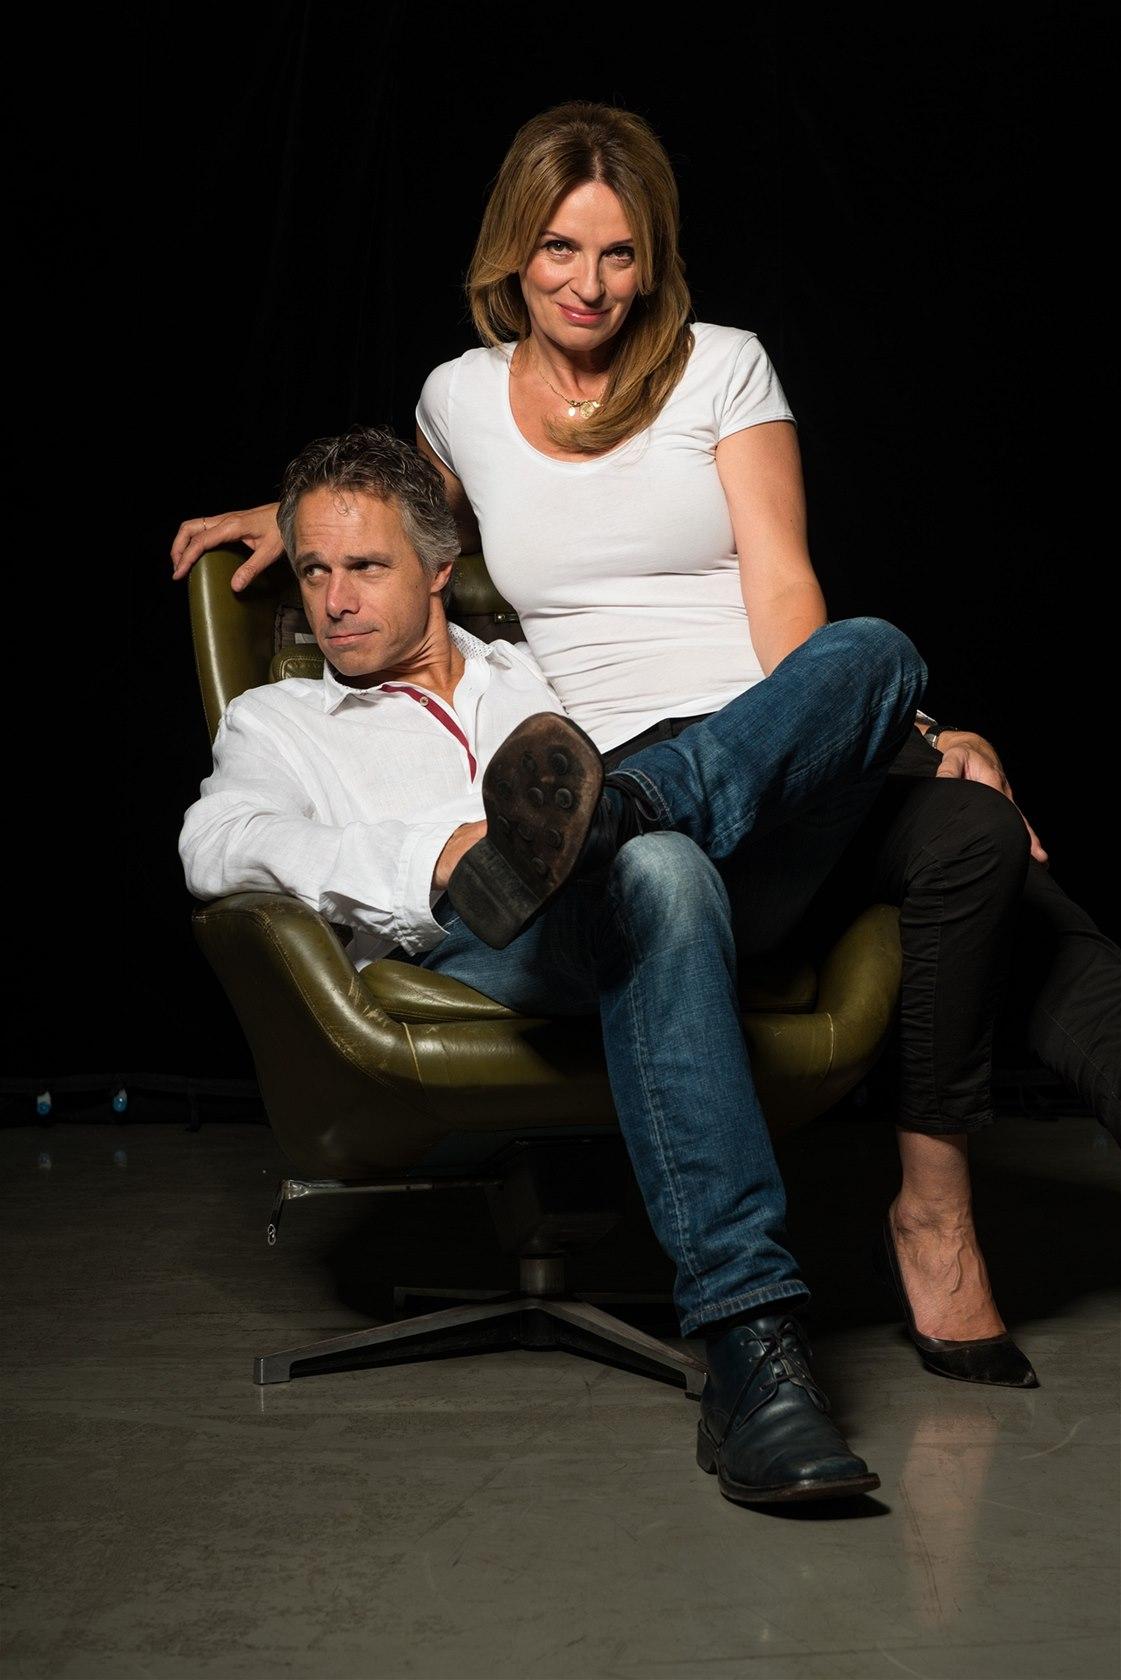 Tony Slattery (born 1959),Princess Tatiana von Furstenberg Porn nude Sonia Bergamasco,Lucie Laurier